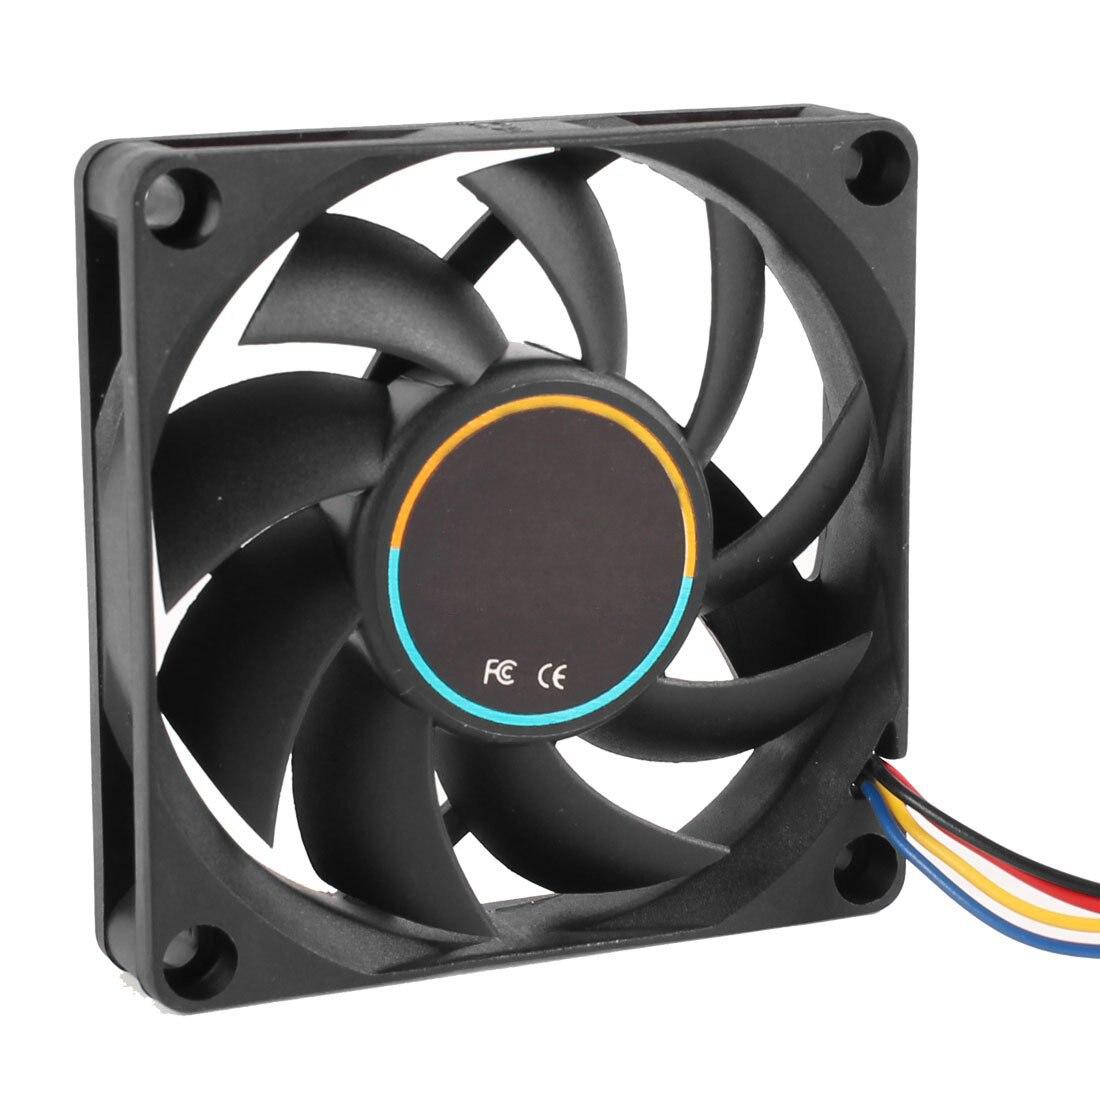 2016 New 70mmx15mm 12V 4 Pins PWM PC Computer Case CPU Cooler Cooling Fan Black aerocool 15 blade 1 56w mute model computer cpu cooling fan black 12 x 12cm 7v